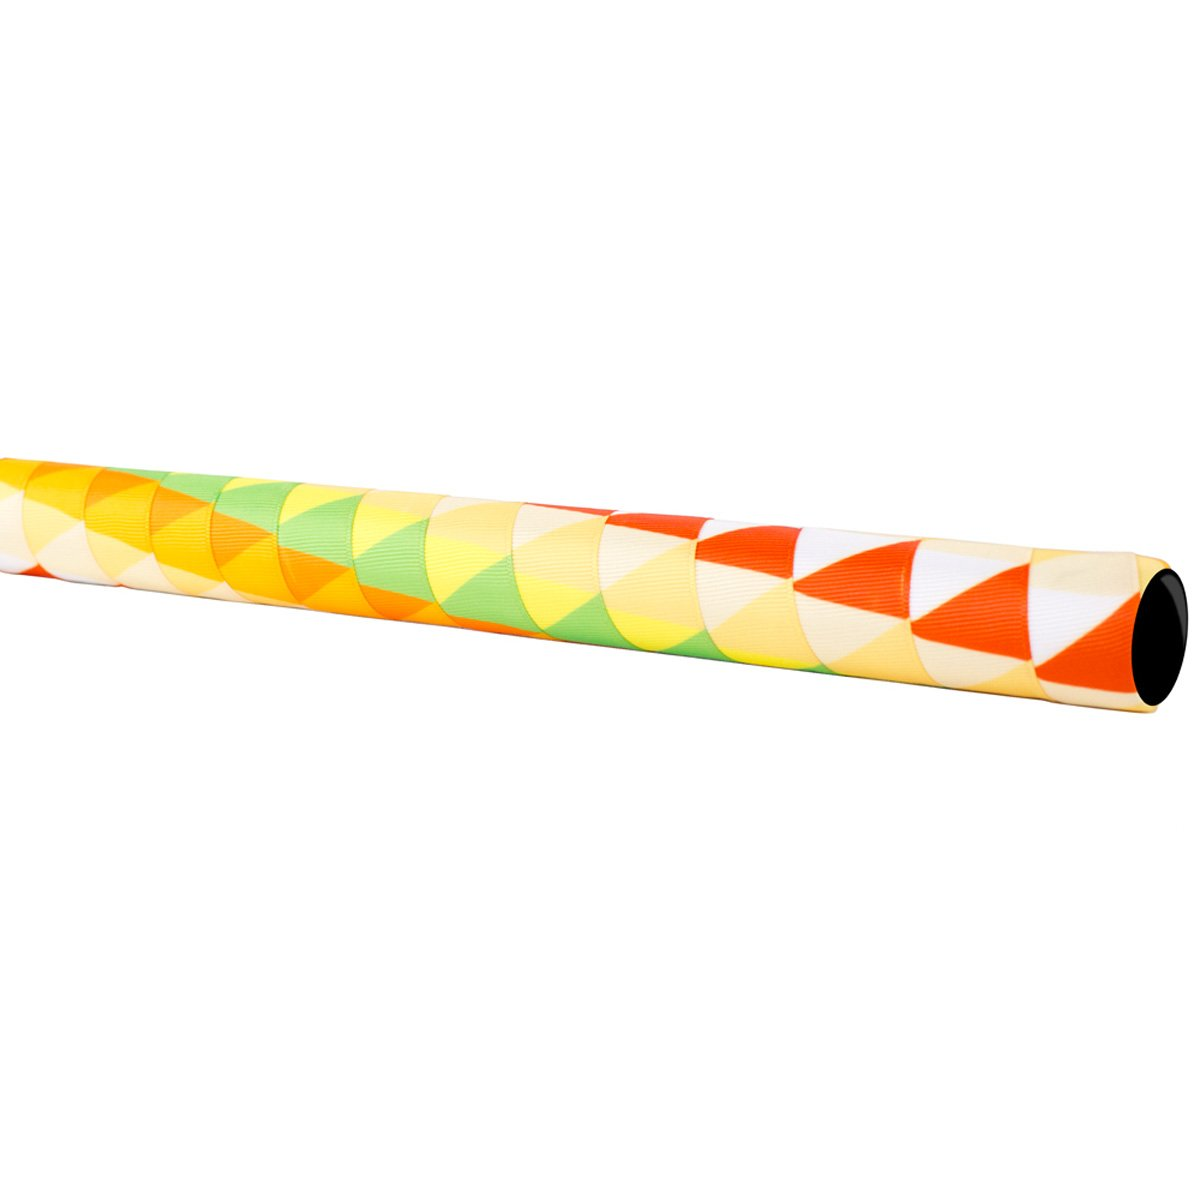 Serfasリボン自転車ハンドルバーテープ B076VVXGY1 YELLOWS/ORANGES/LIME GREEN/WHITE TRIANGLES YELLOWS/ORANGES/LIME GREEN/WHITE TRIANGLES